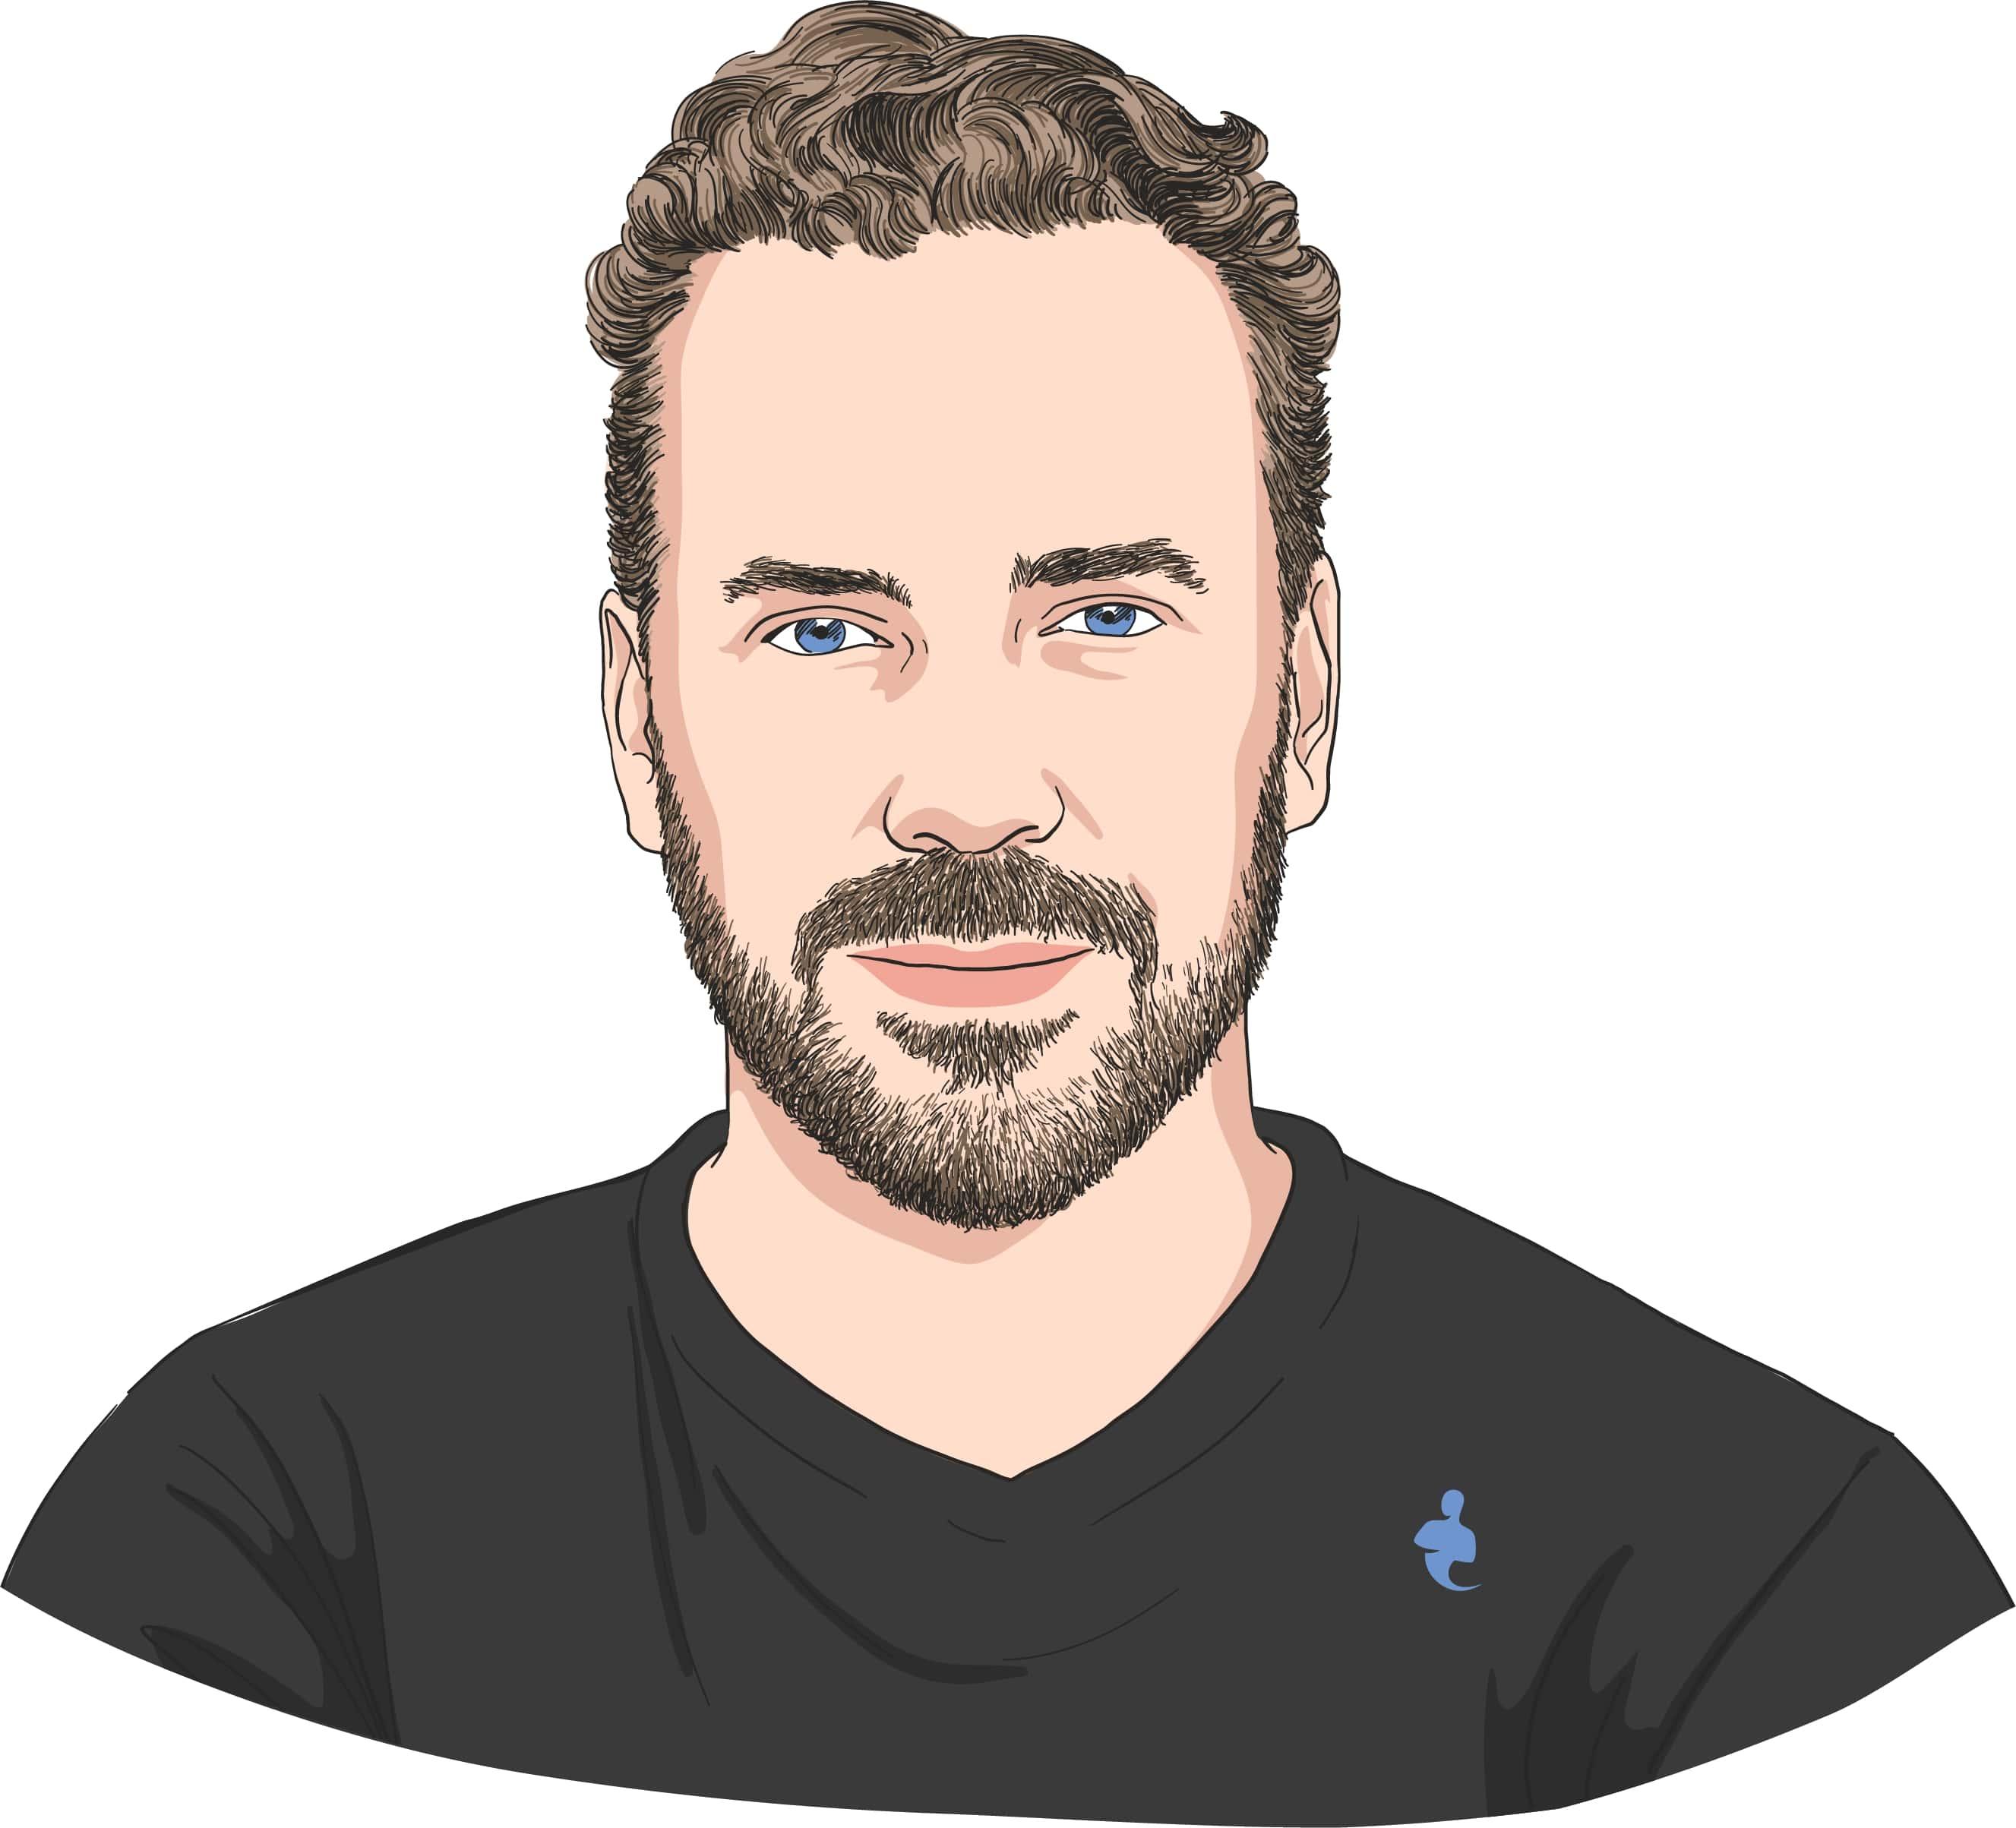 Luke Freiler, CEO and co-founder of Centercode